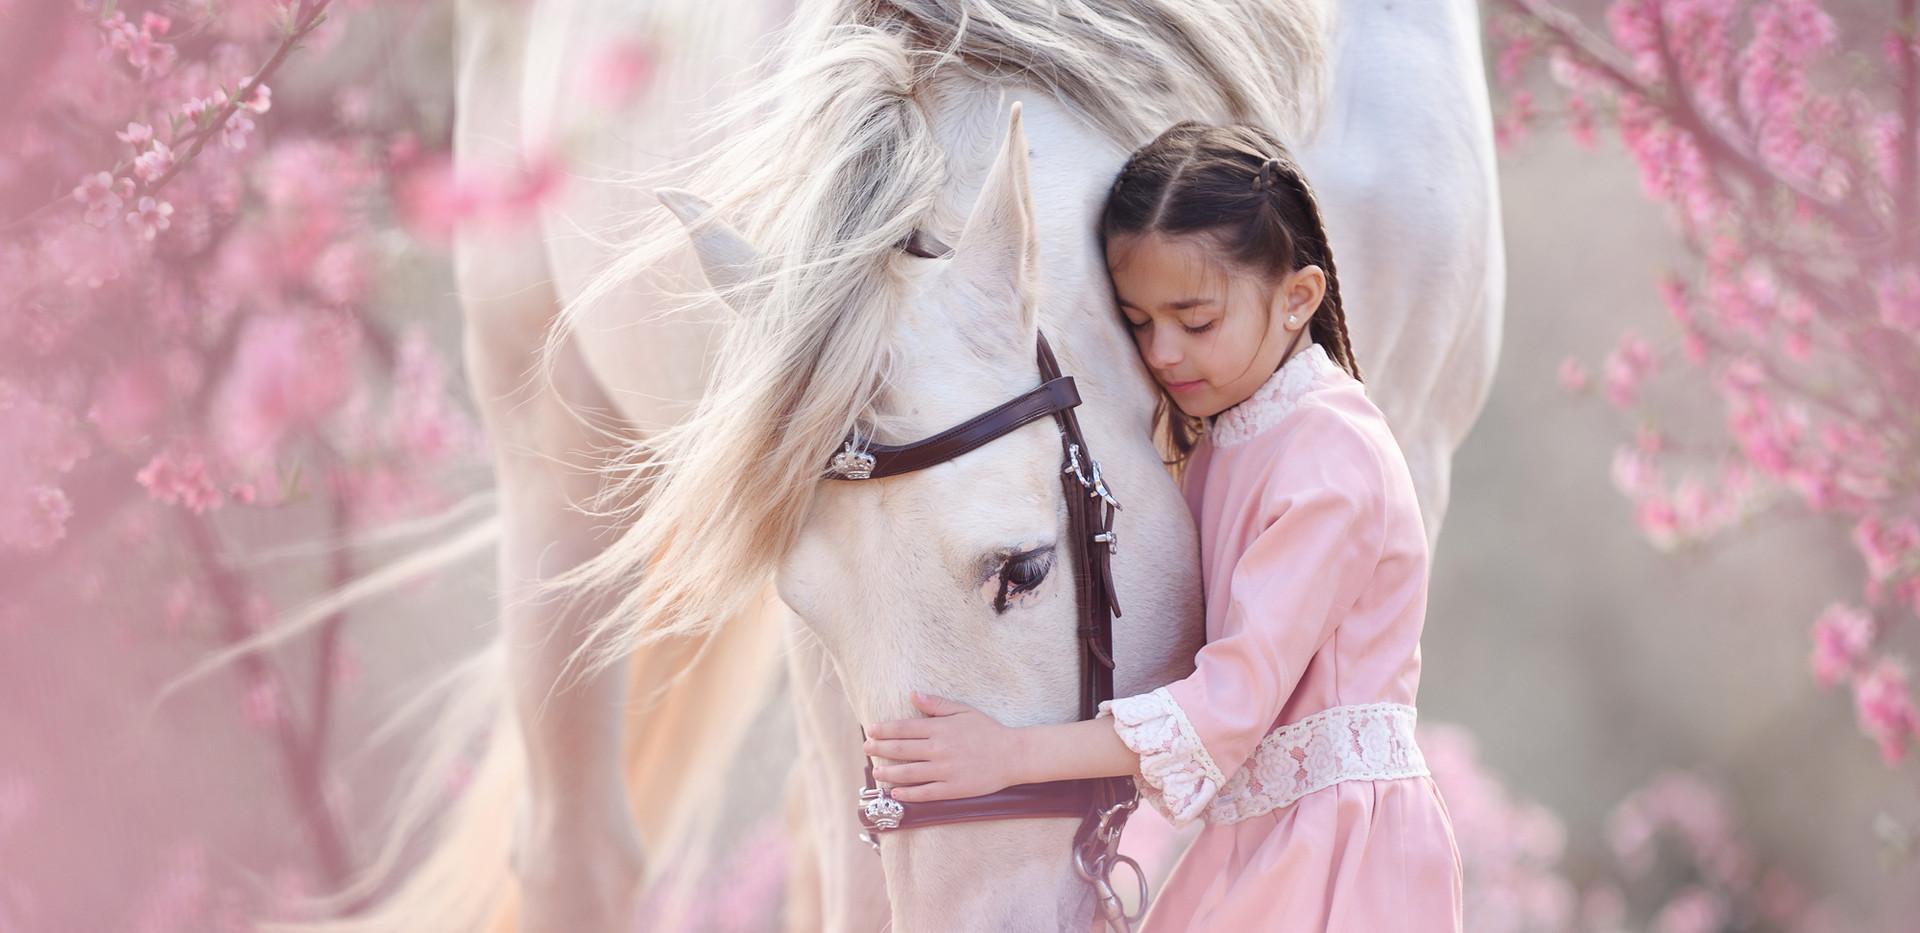 03-März_Majestic-Horses-Kind-Pferd_print